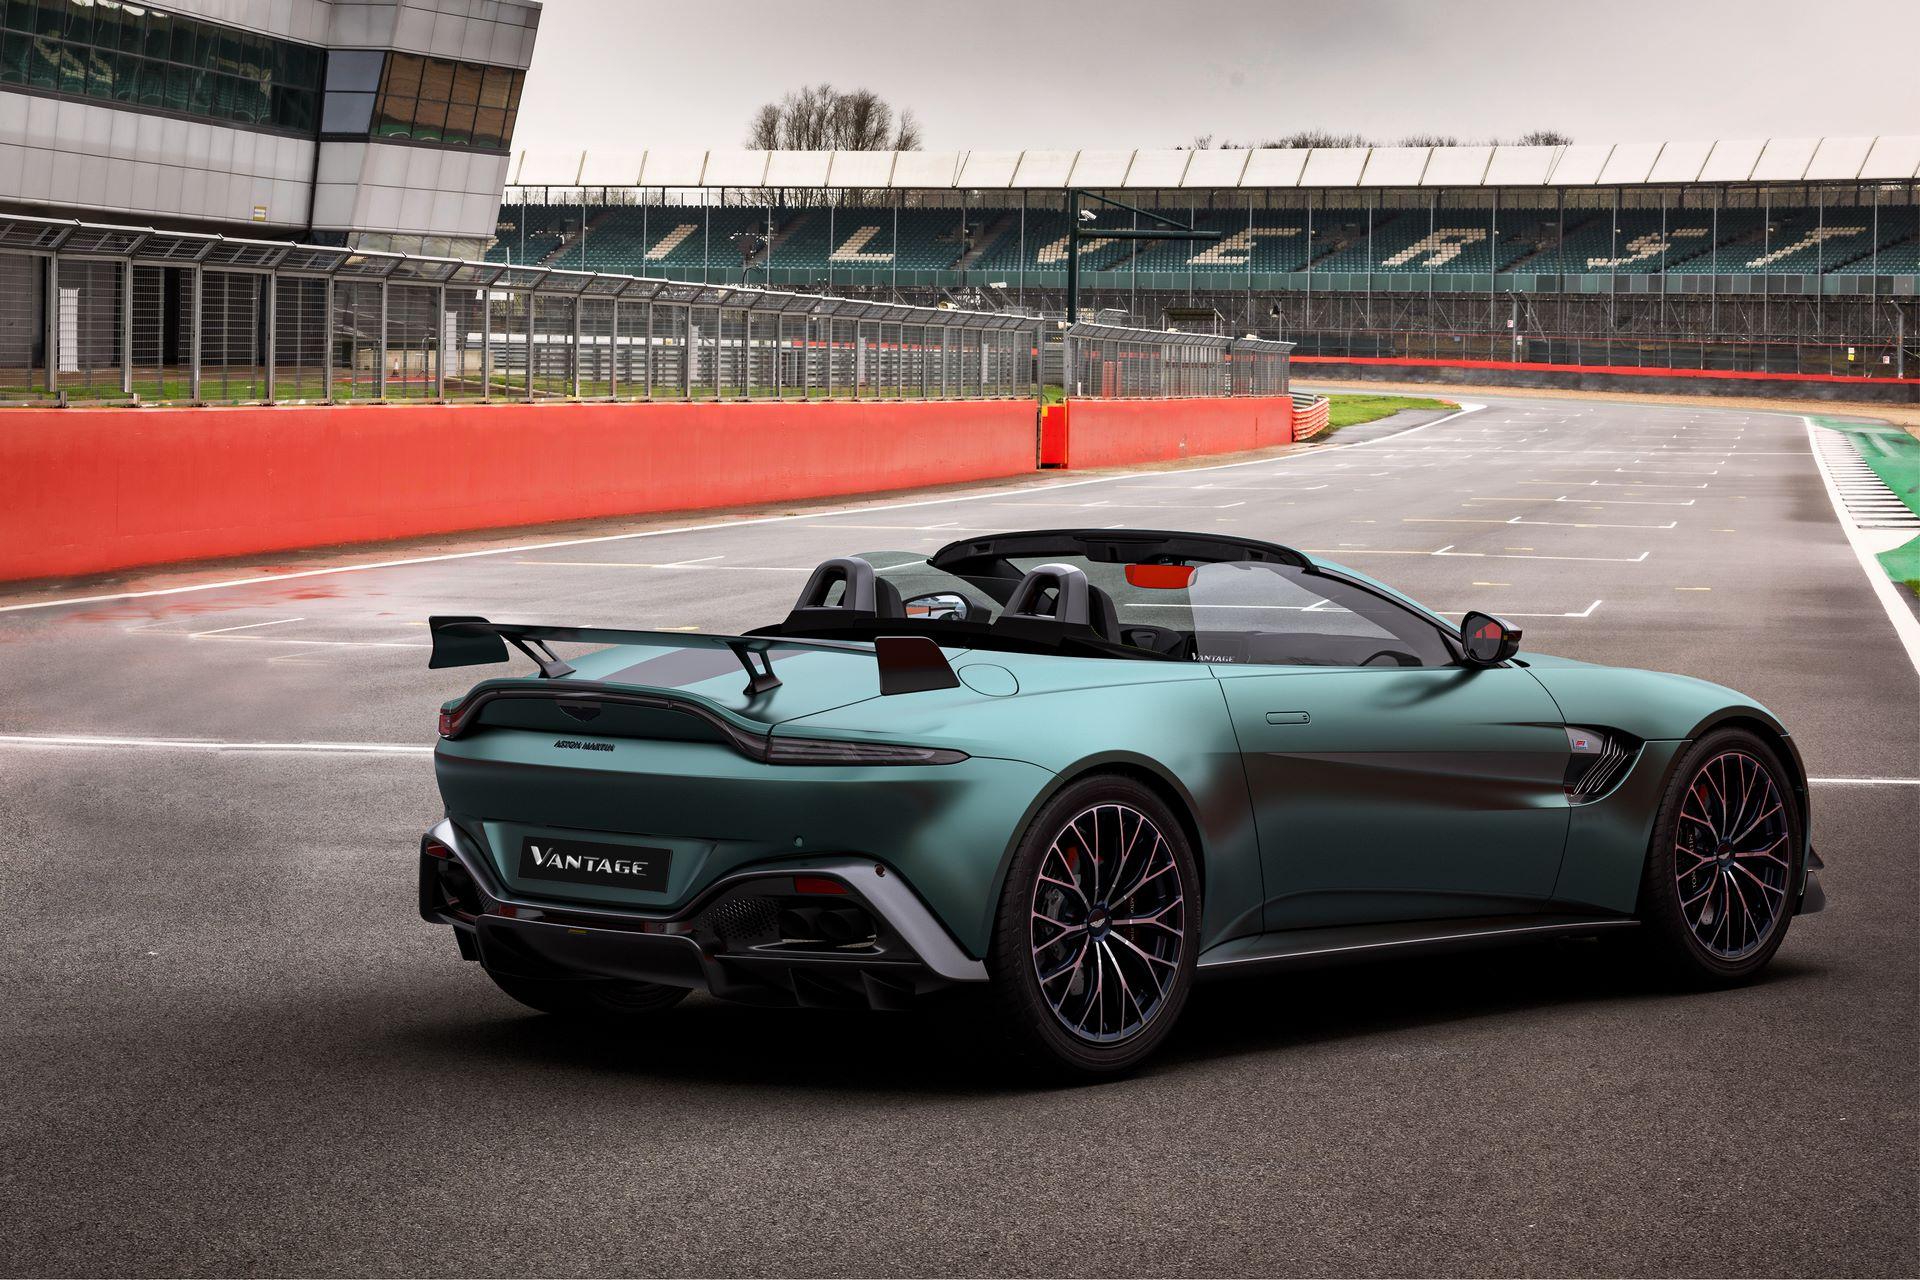 Aston-Martin-Vantage-F1-Edition-9